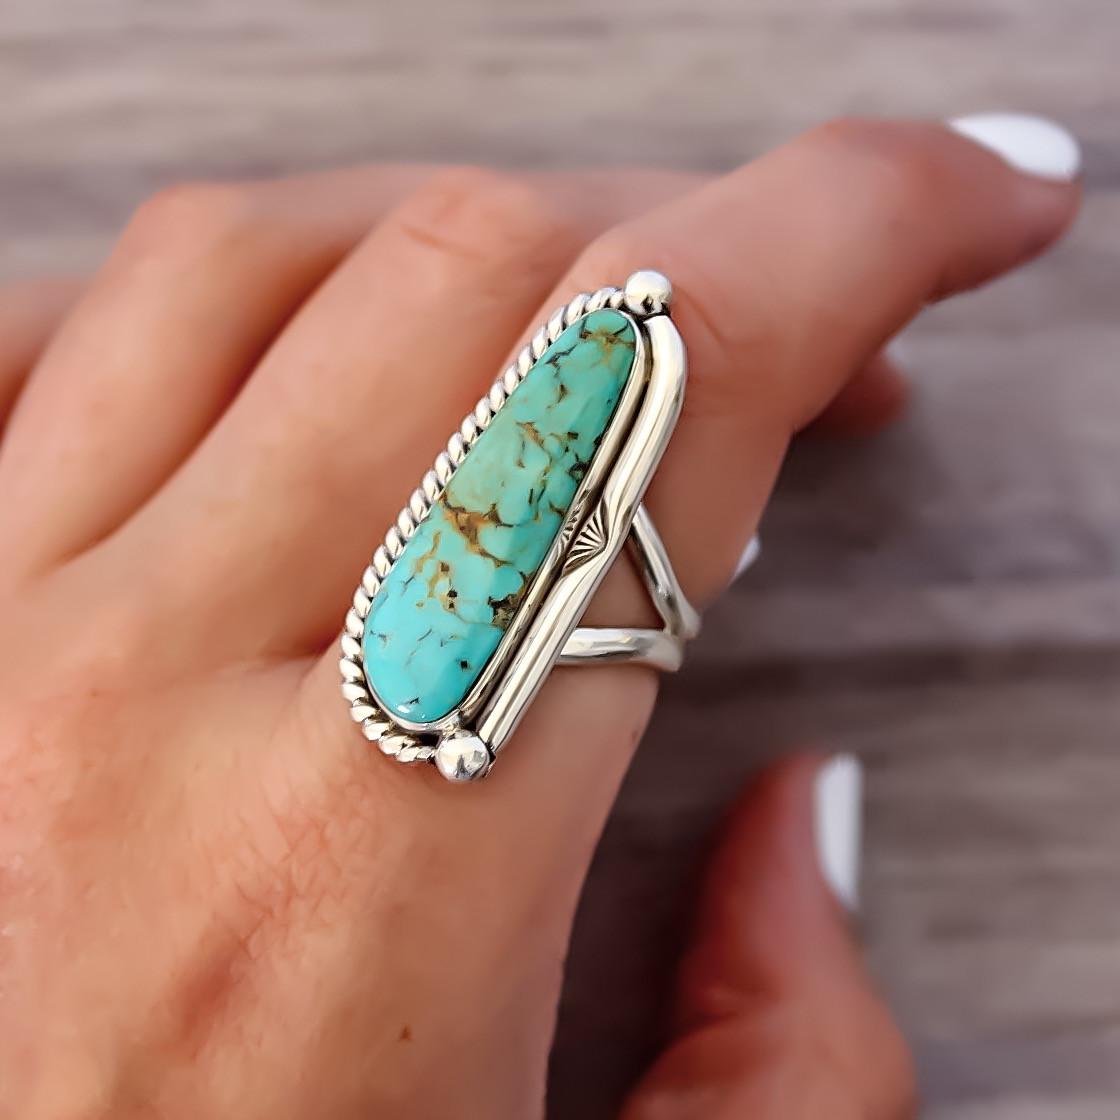 Navajo_Half_Twist_Turquoise_Ring_Bohemian_Jewellery_Indie_and_Harper